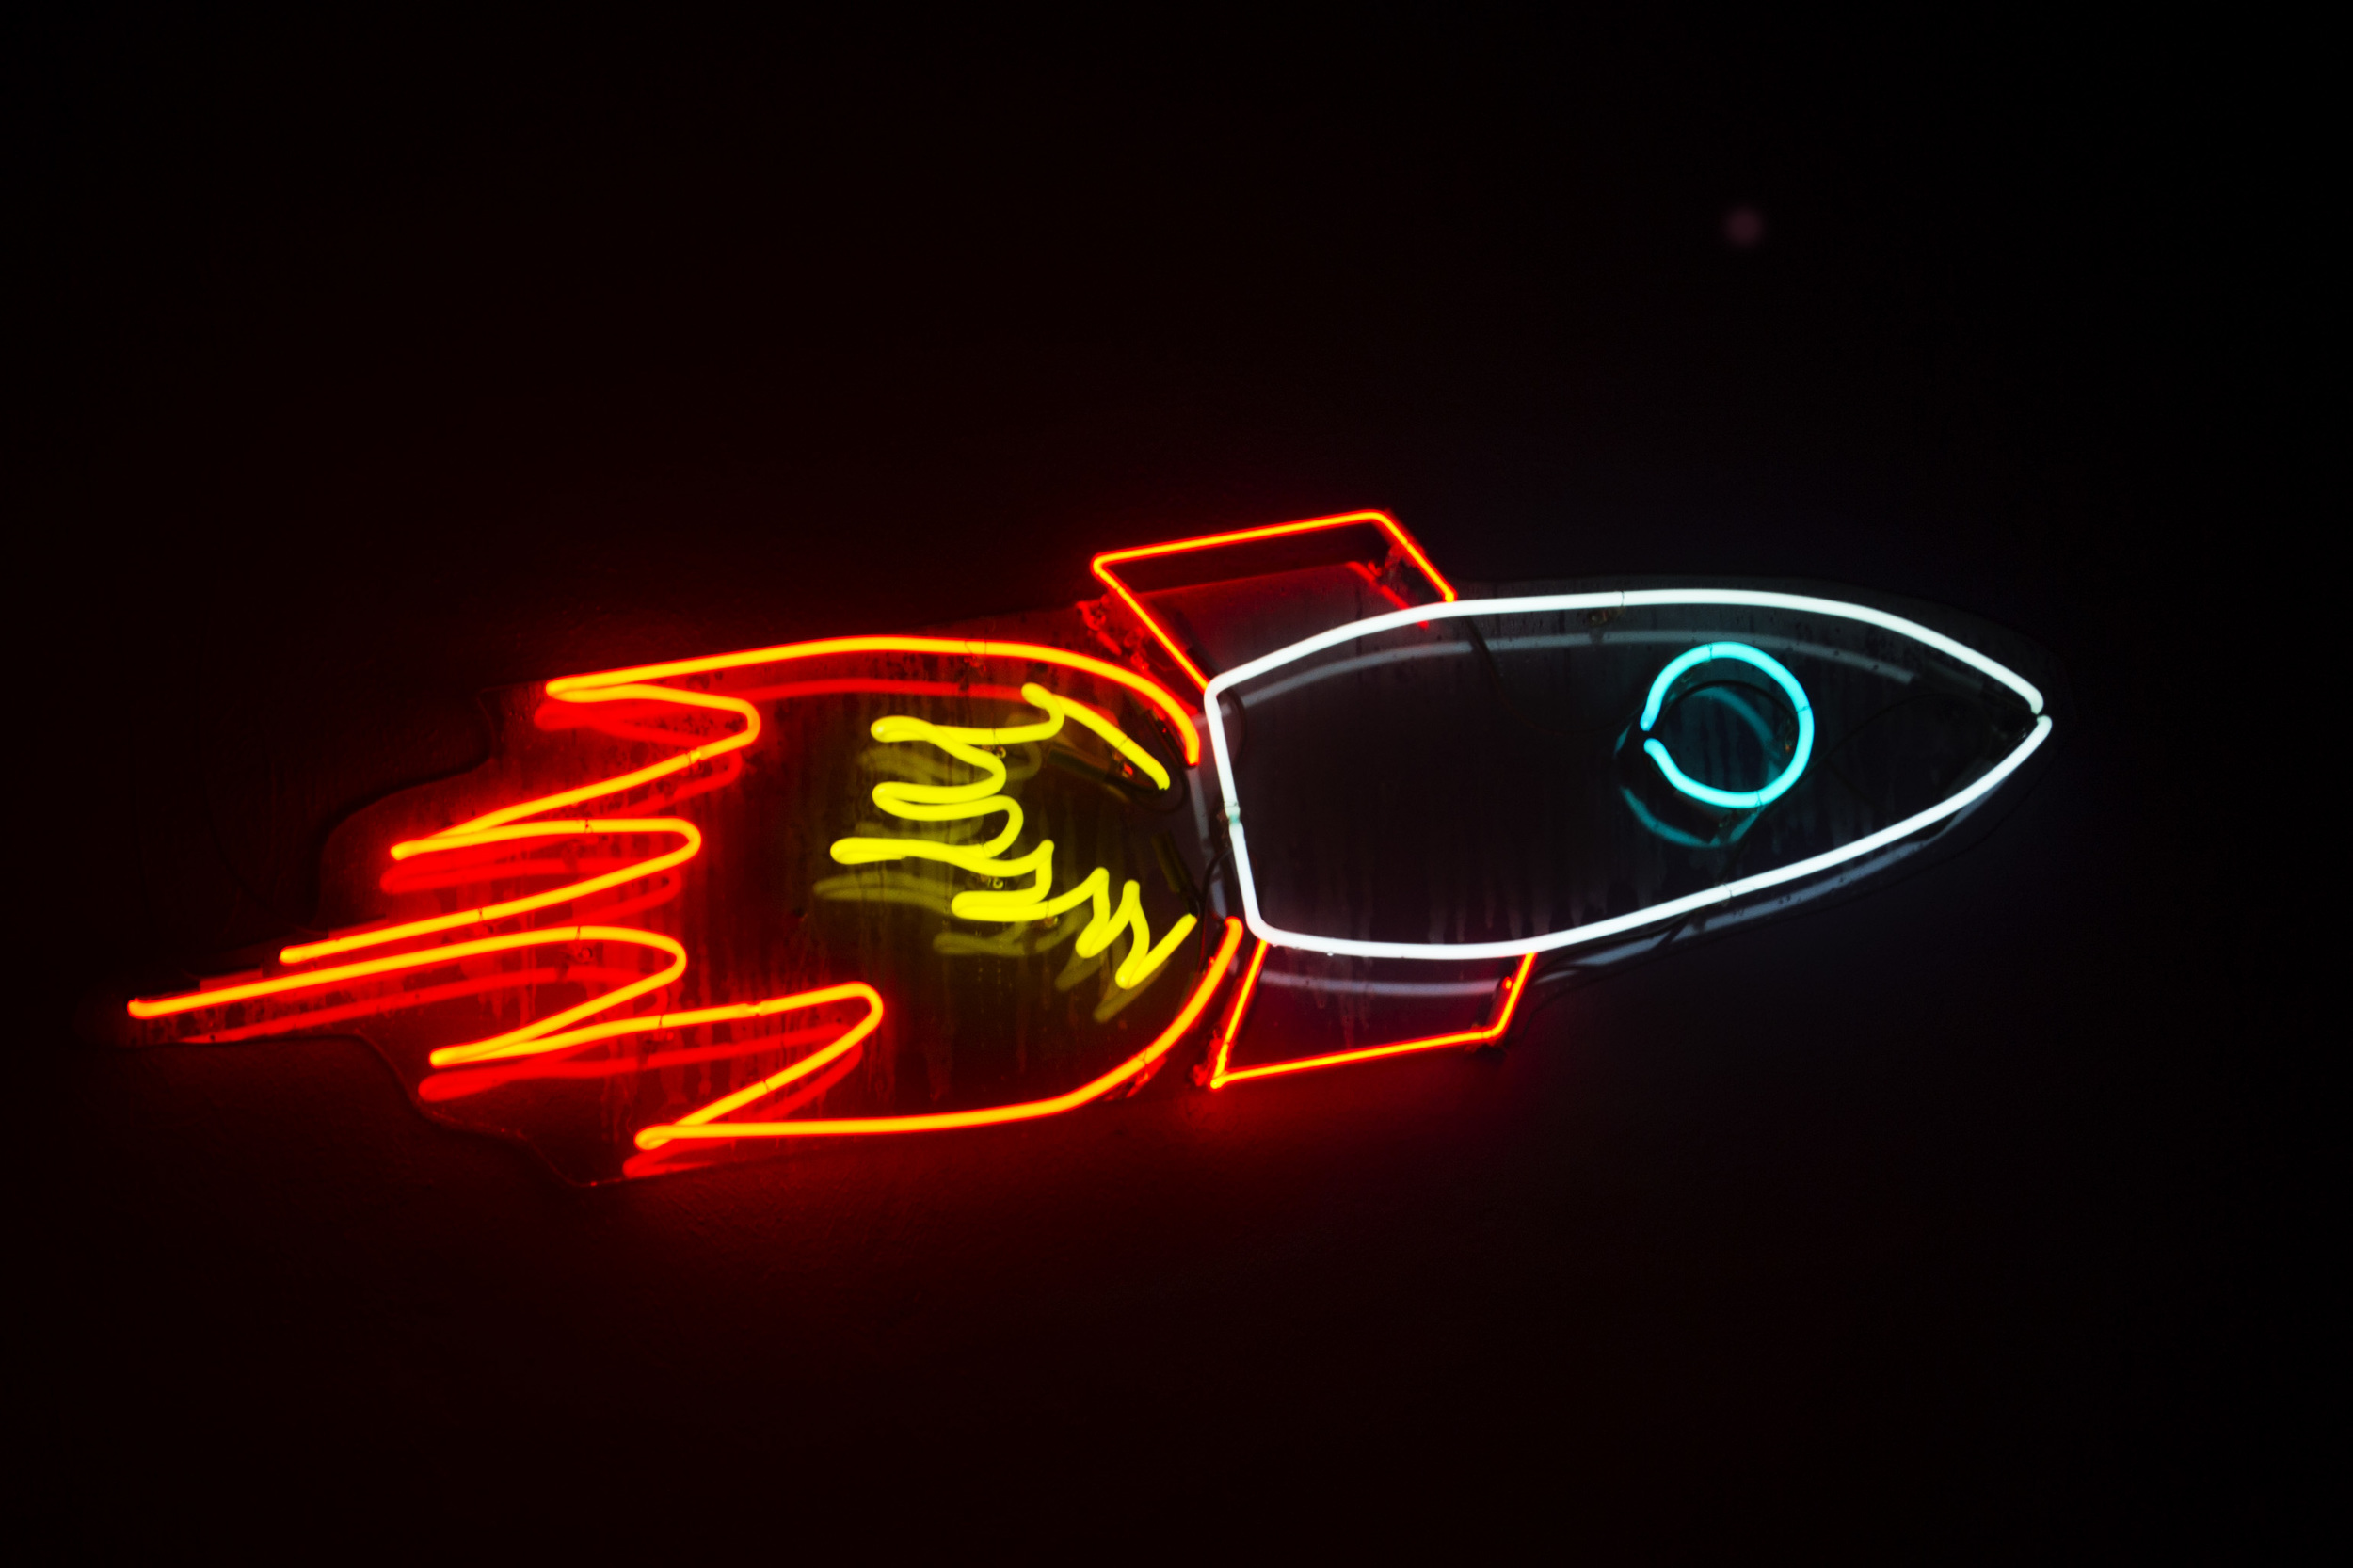 rocketship1.jpg